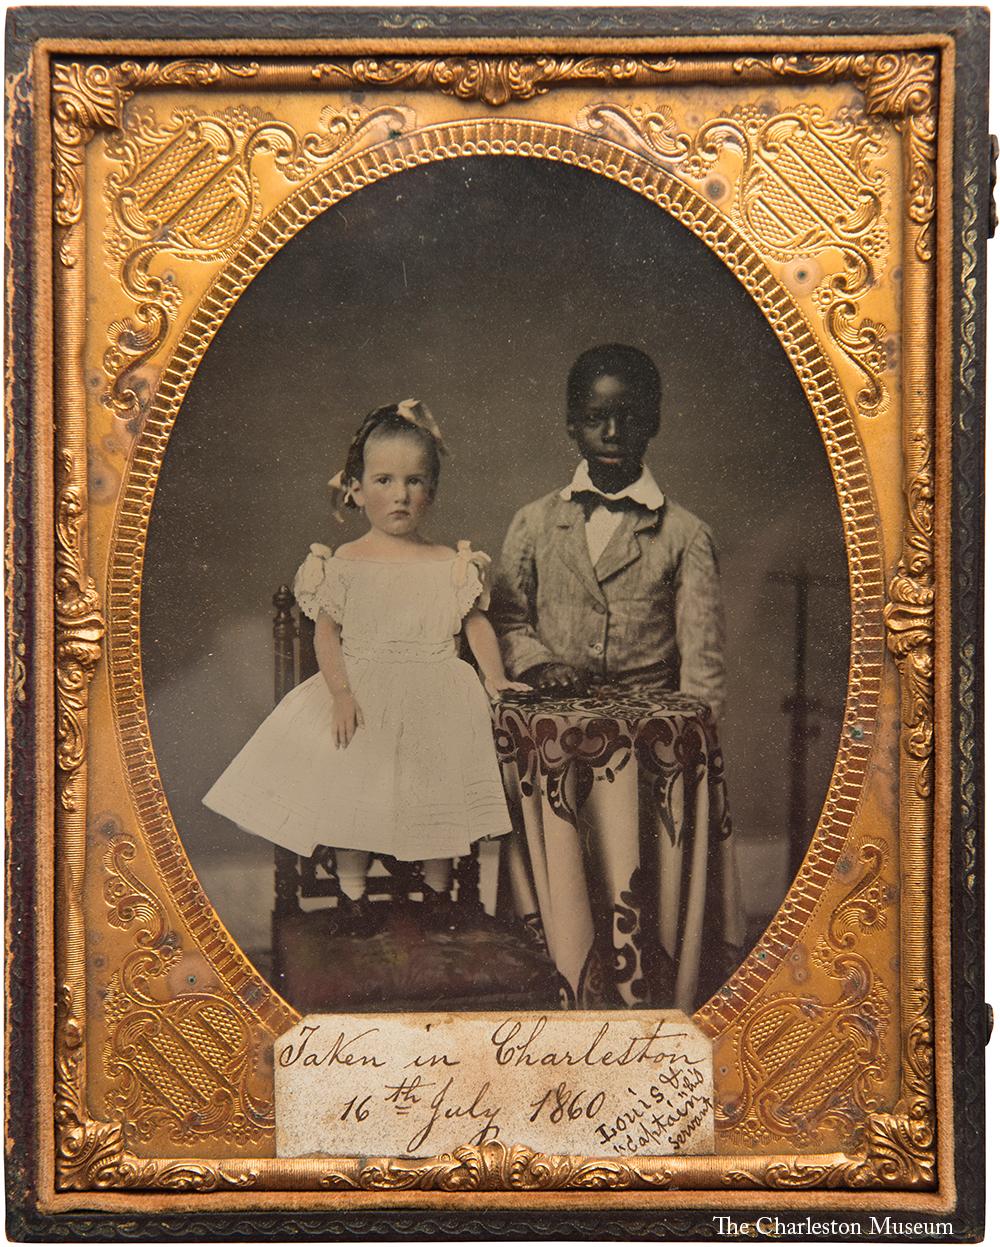 Louis Manigault & Captain, 1860, ambrotype, 4 x 6¾ inches. 1999.57.15. Courtesy of The Charleston Museum, Charleston, South Carolina, www. charlestonmuseum. org.